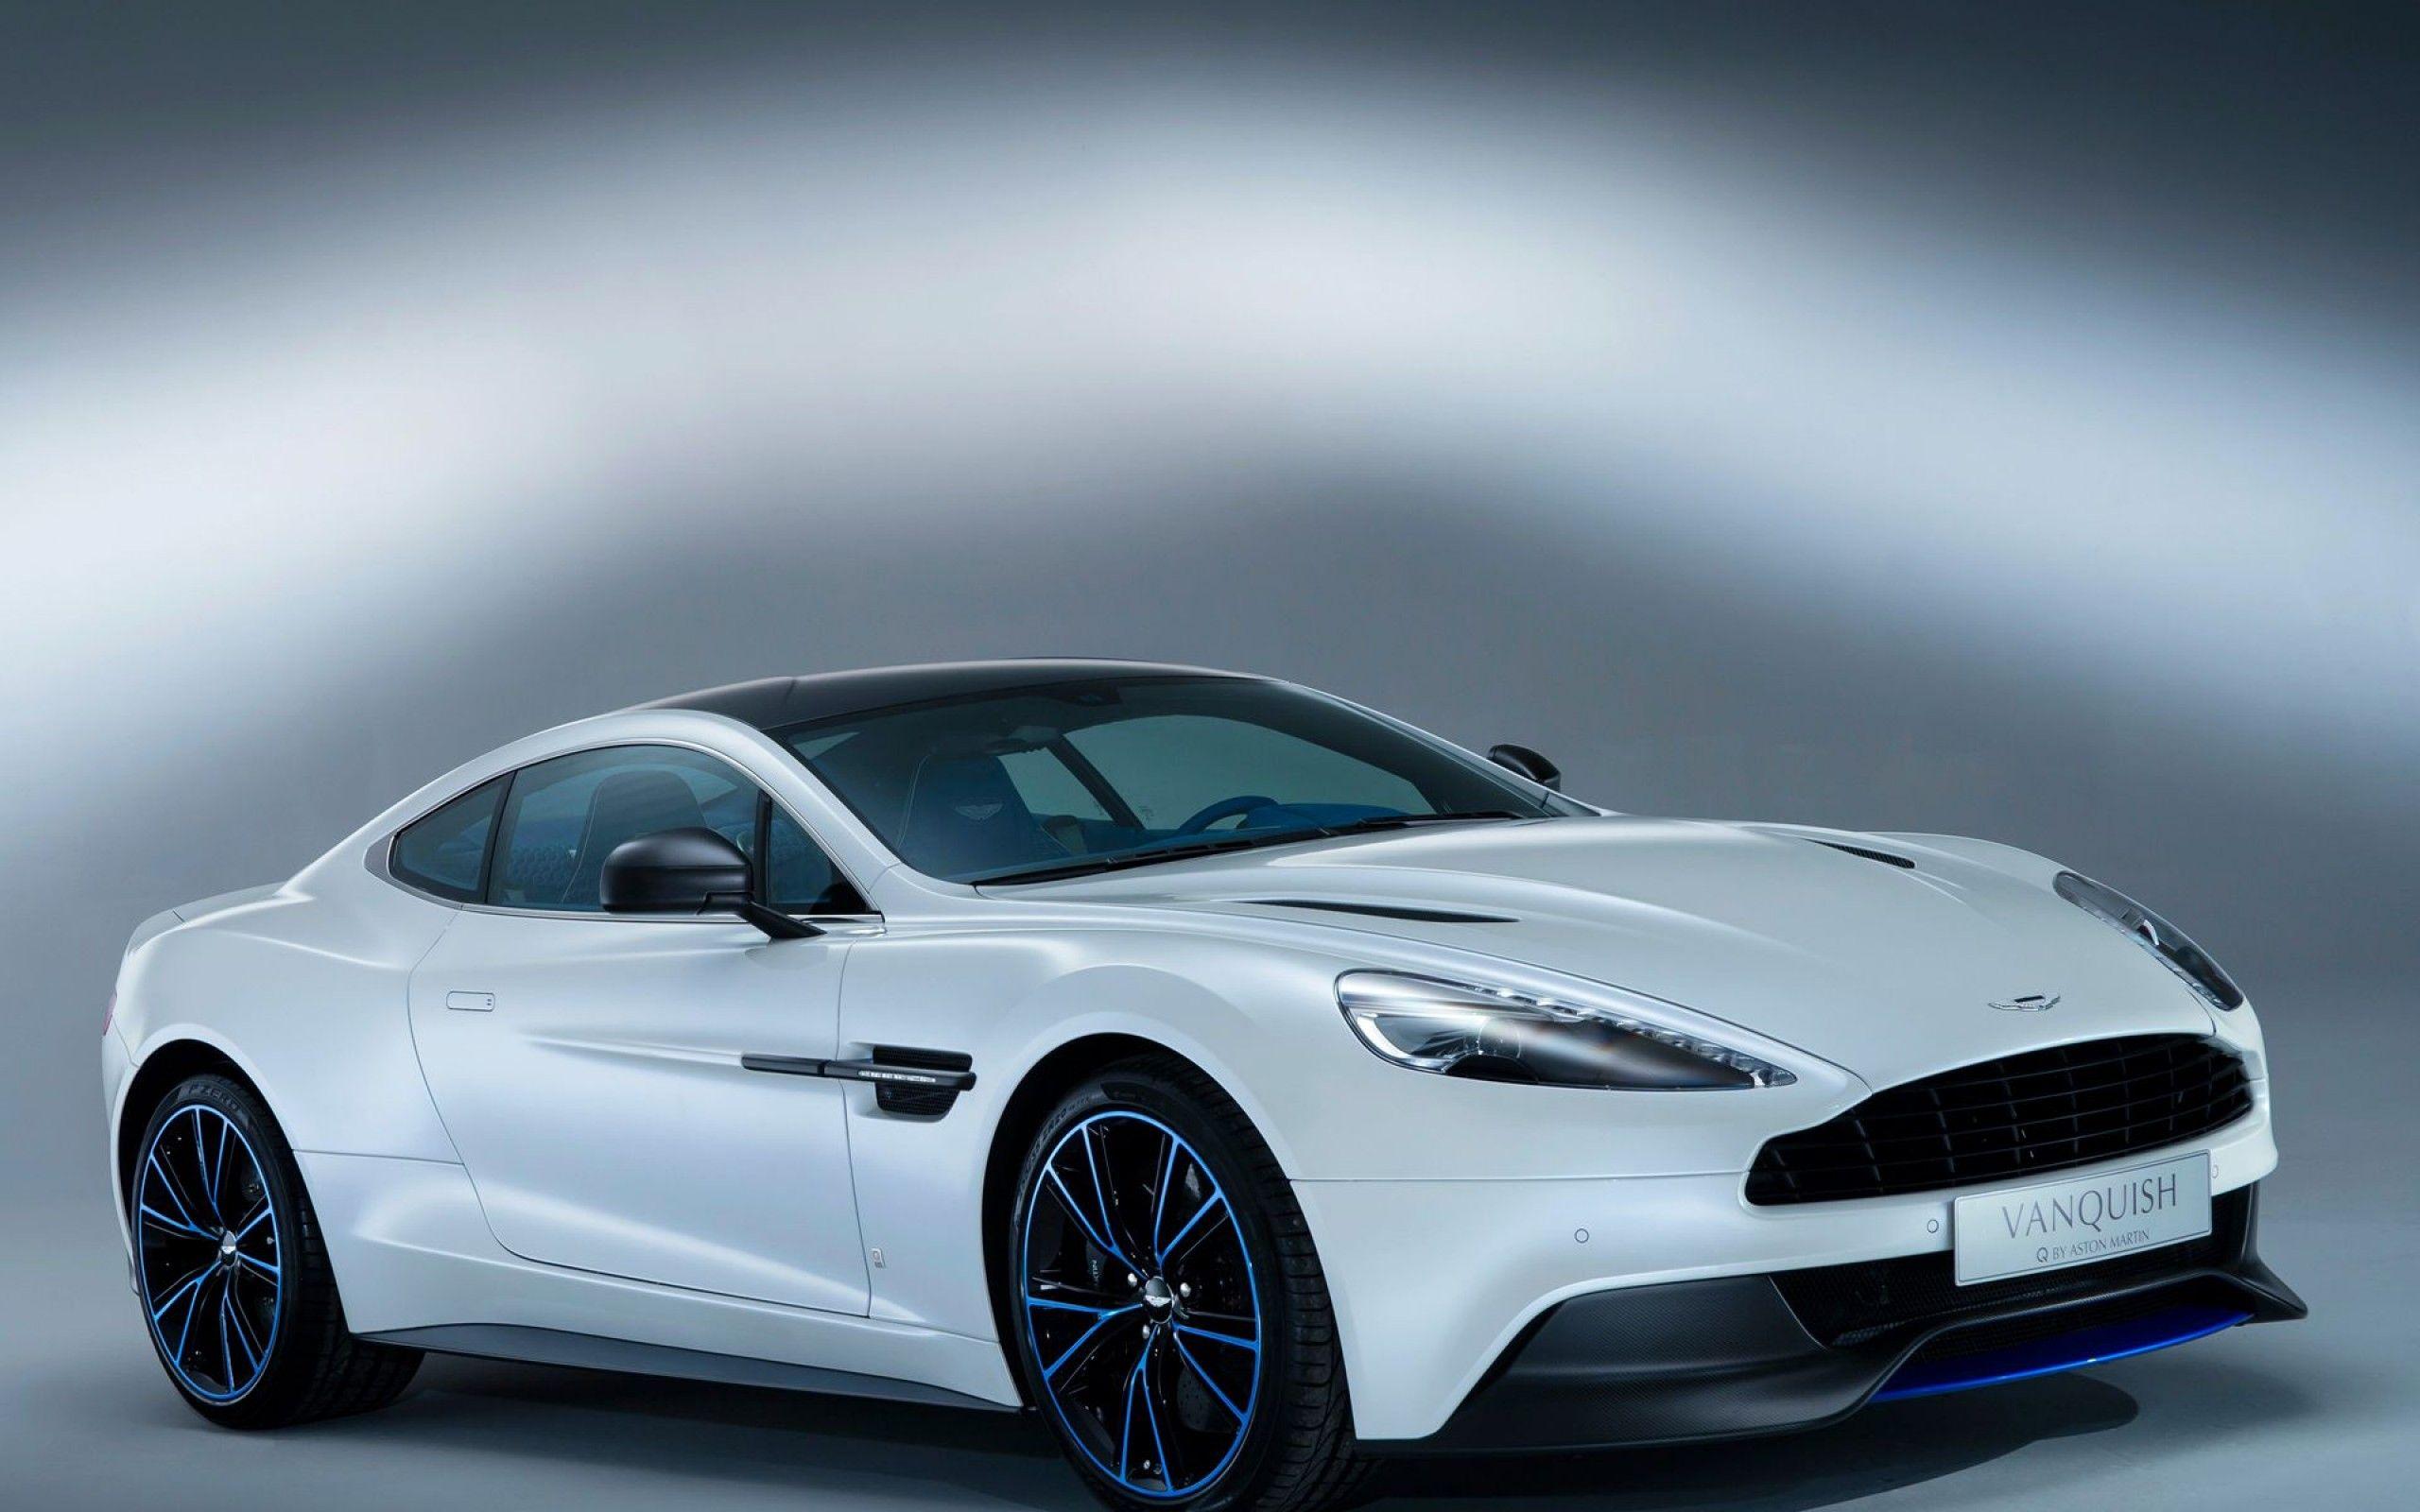 2013 Aston Martin Vanquish Coupe Cars Pinterest